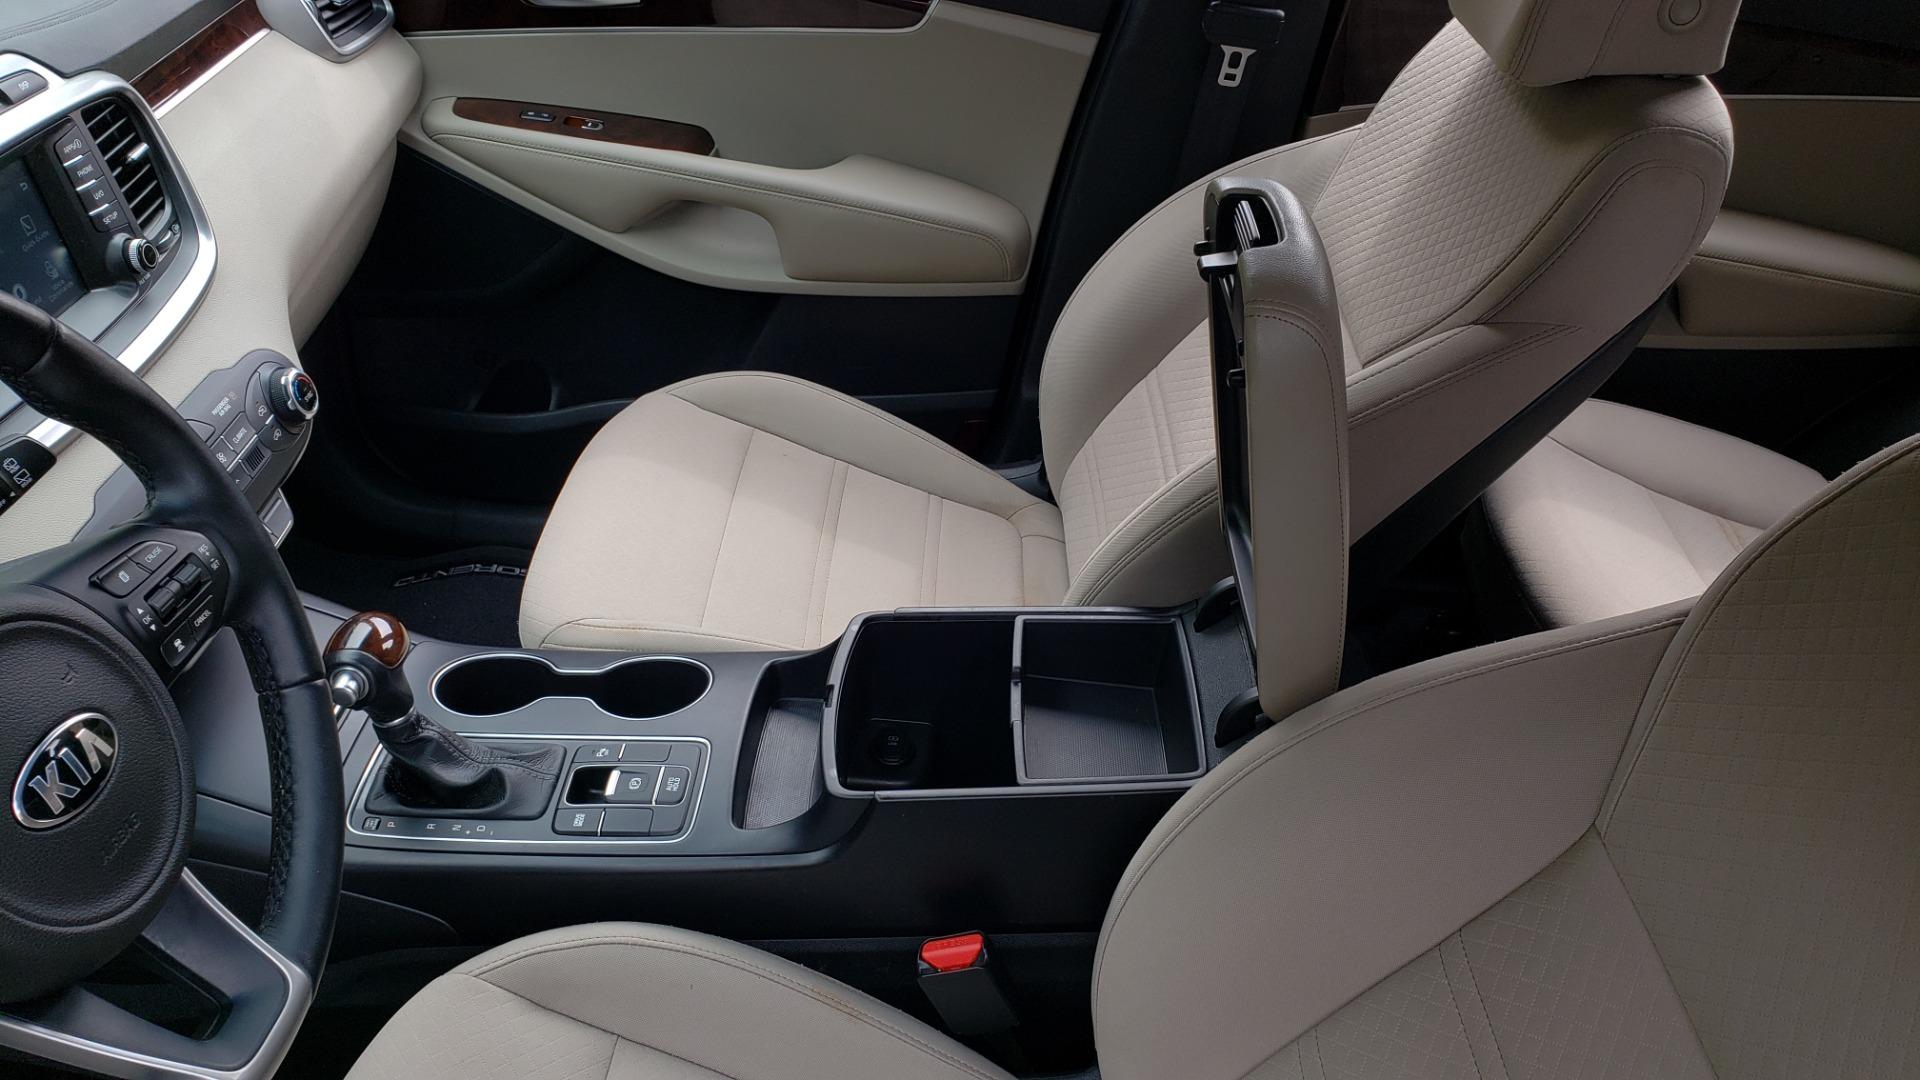 Used 2017 Kia SORENTO LX CONV PKG / FWD / ADVANCED TECH / 3-ROW for sale Sold at Formula Imports in Charlotte NC 28227 56